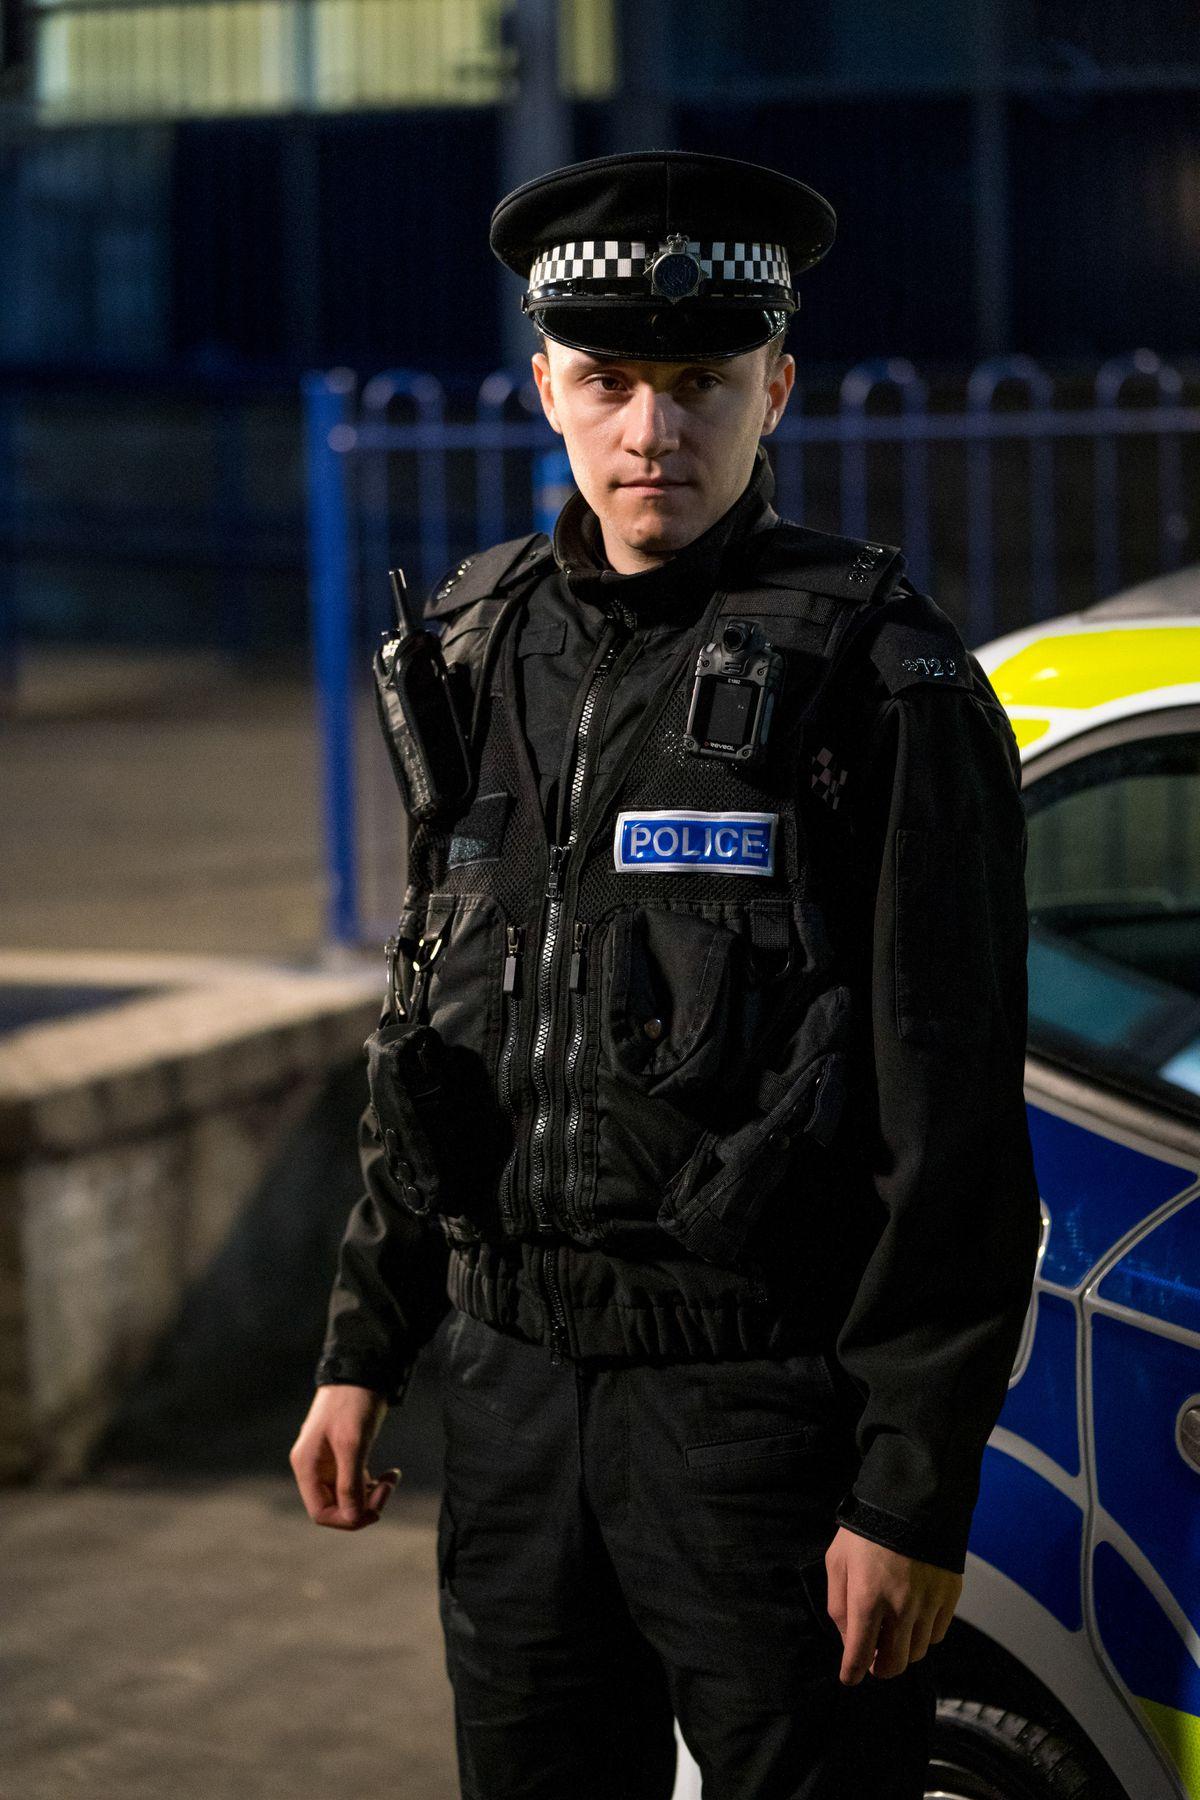 Ryan Pilkington (Gregory Piper) - (C) World Productions - Photographer: Steffan Hill.